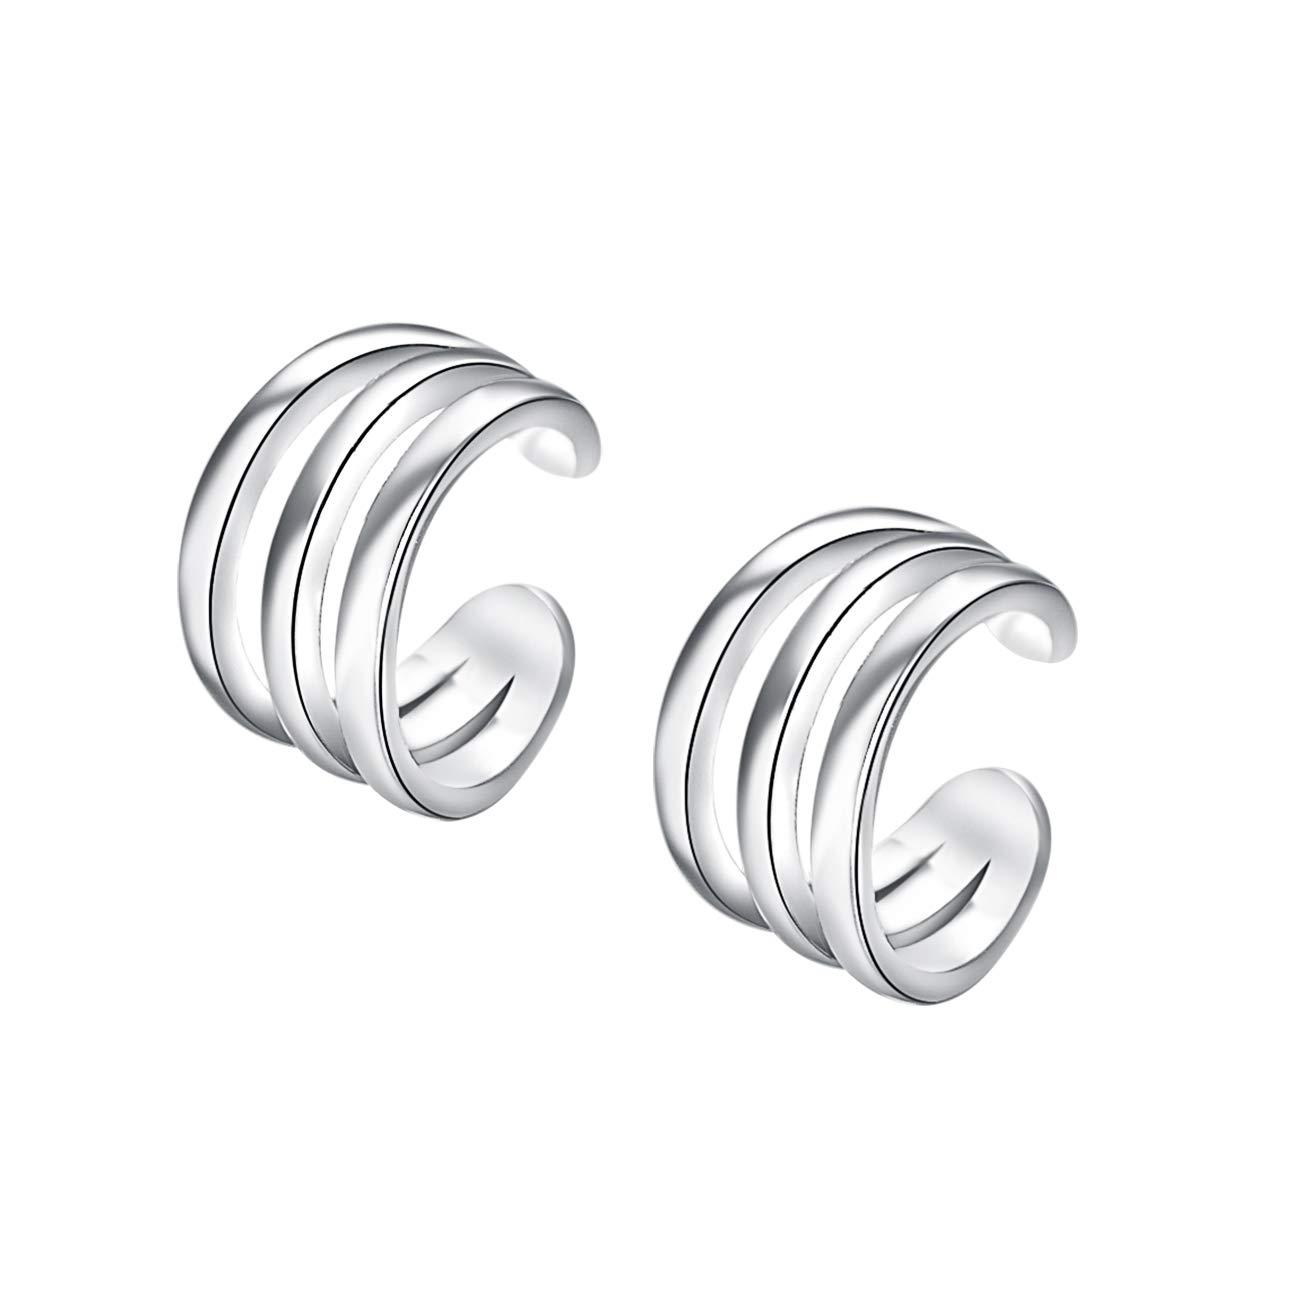 Yoursfs Ear Cuff Non-piercing Cuff Earring Helix Cartilage Earrings for Womens Italina E647W1